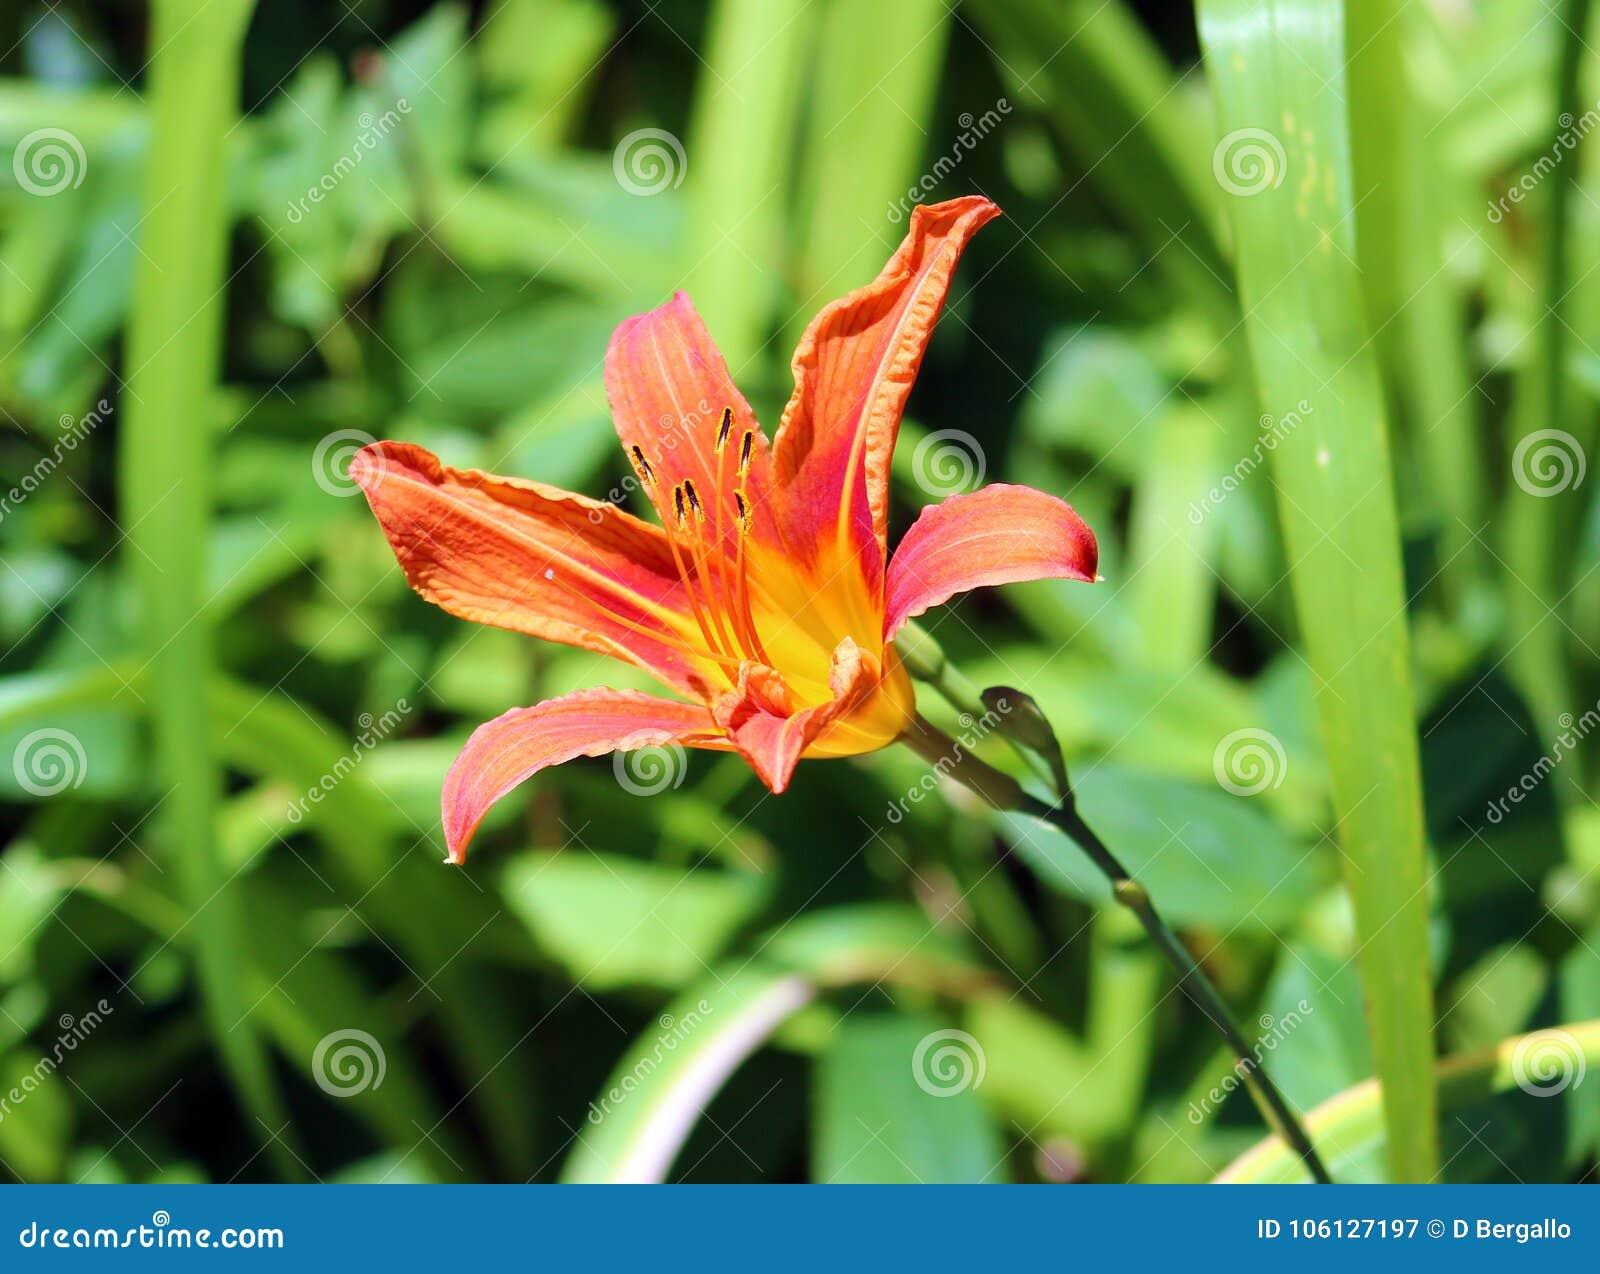 Lily Flower Beautiful Orange Flower In Summer Stock Image Image